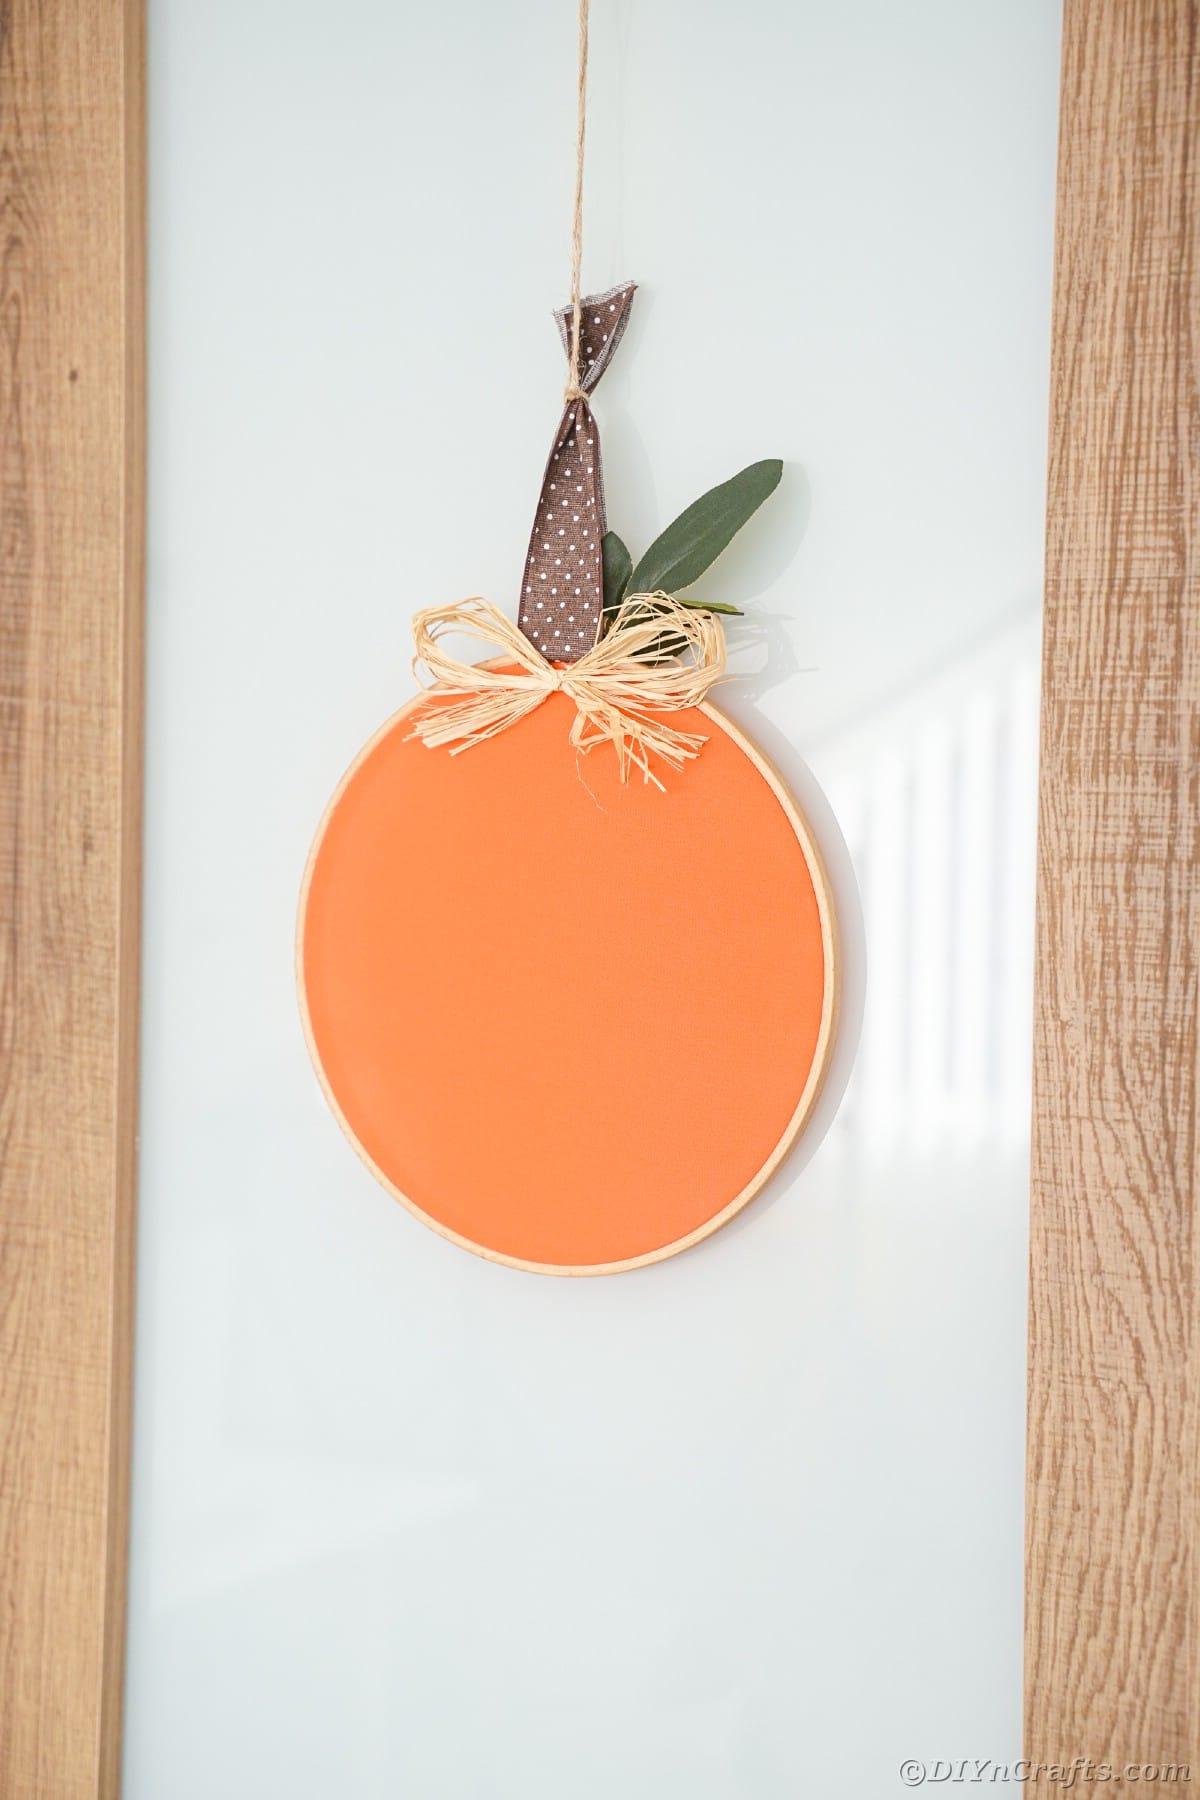 cloth pumpkin hung on the glass door